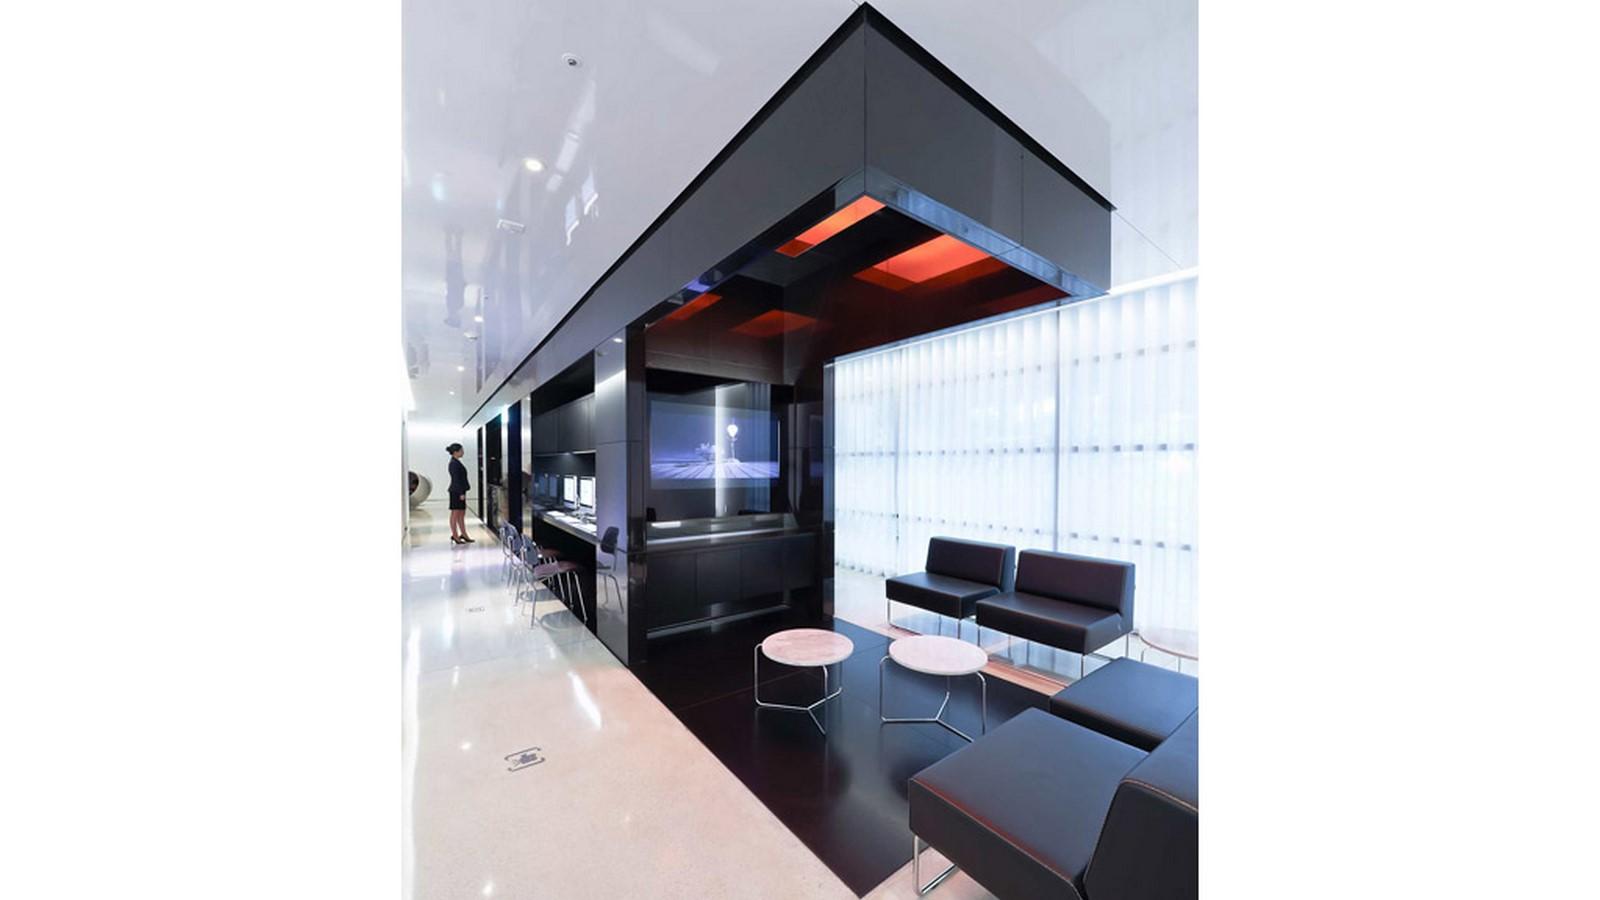 HyundaiCard Air Lounge - Incheon International Airport - Sheet3